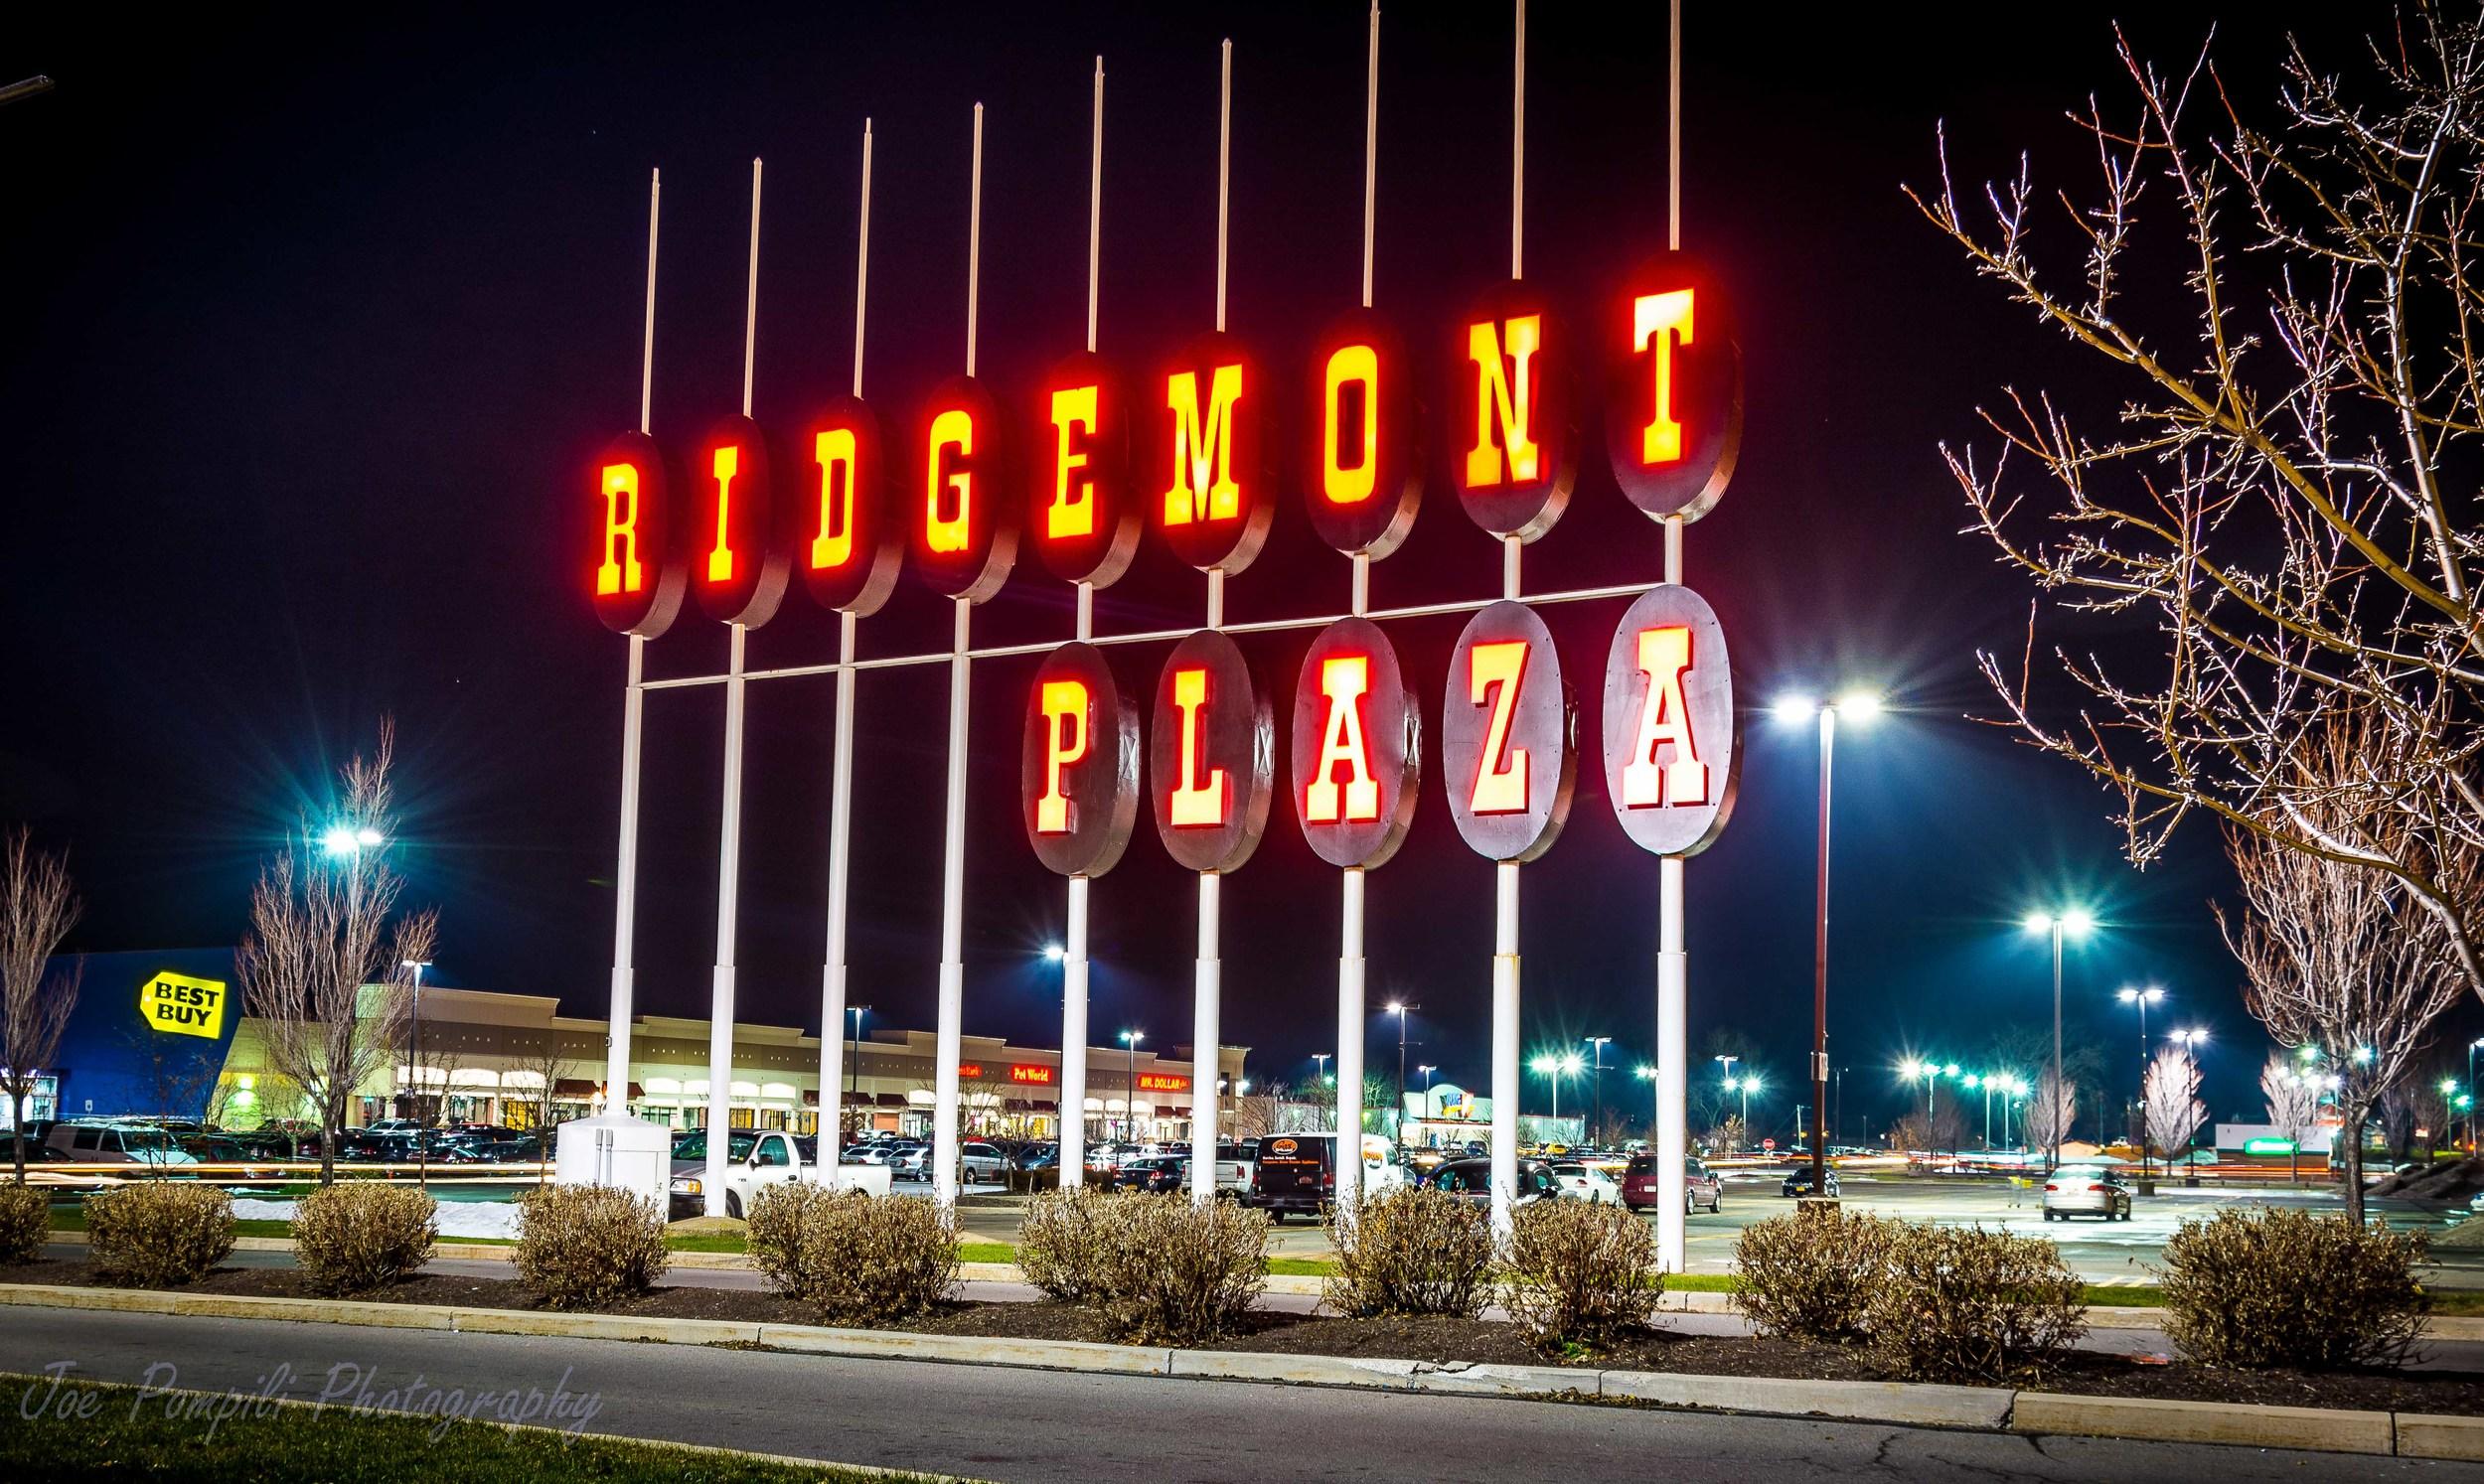 Old Ridgemont Plaza Sign (#12G)